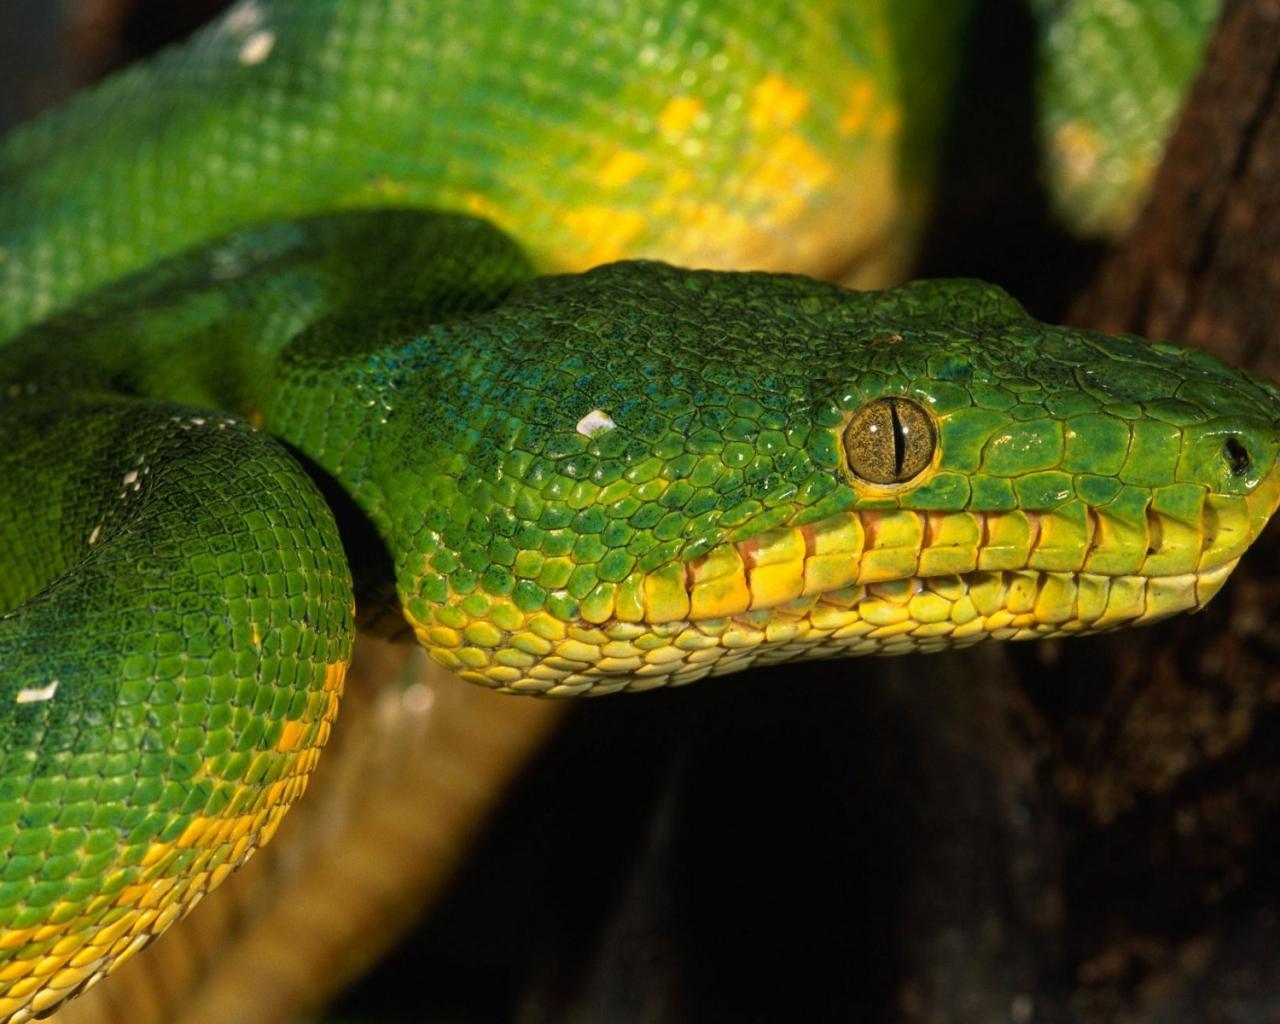 Serpiente verde - 1280x1024